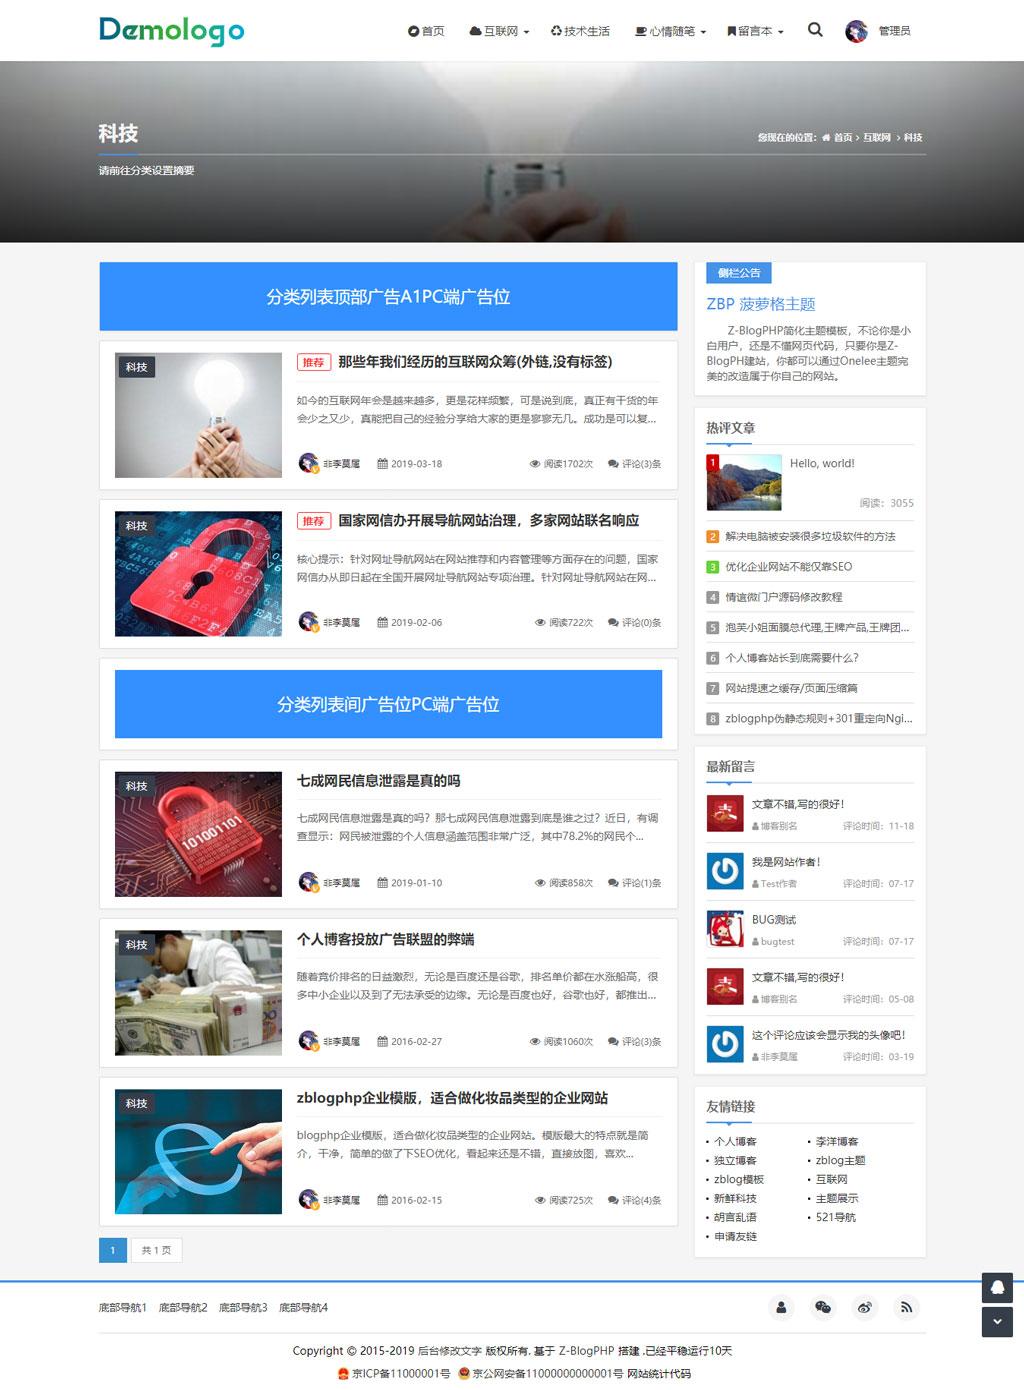 onelee主题分类列表预览图.jpg